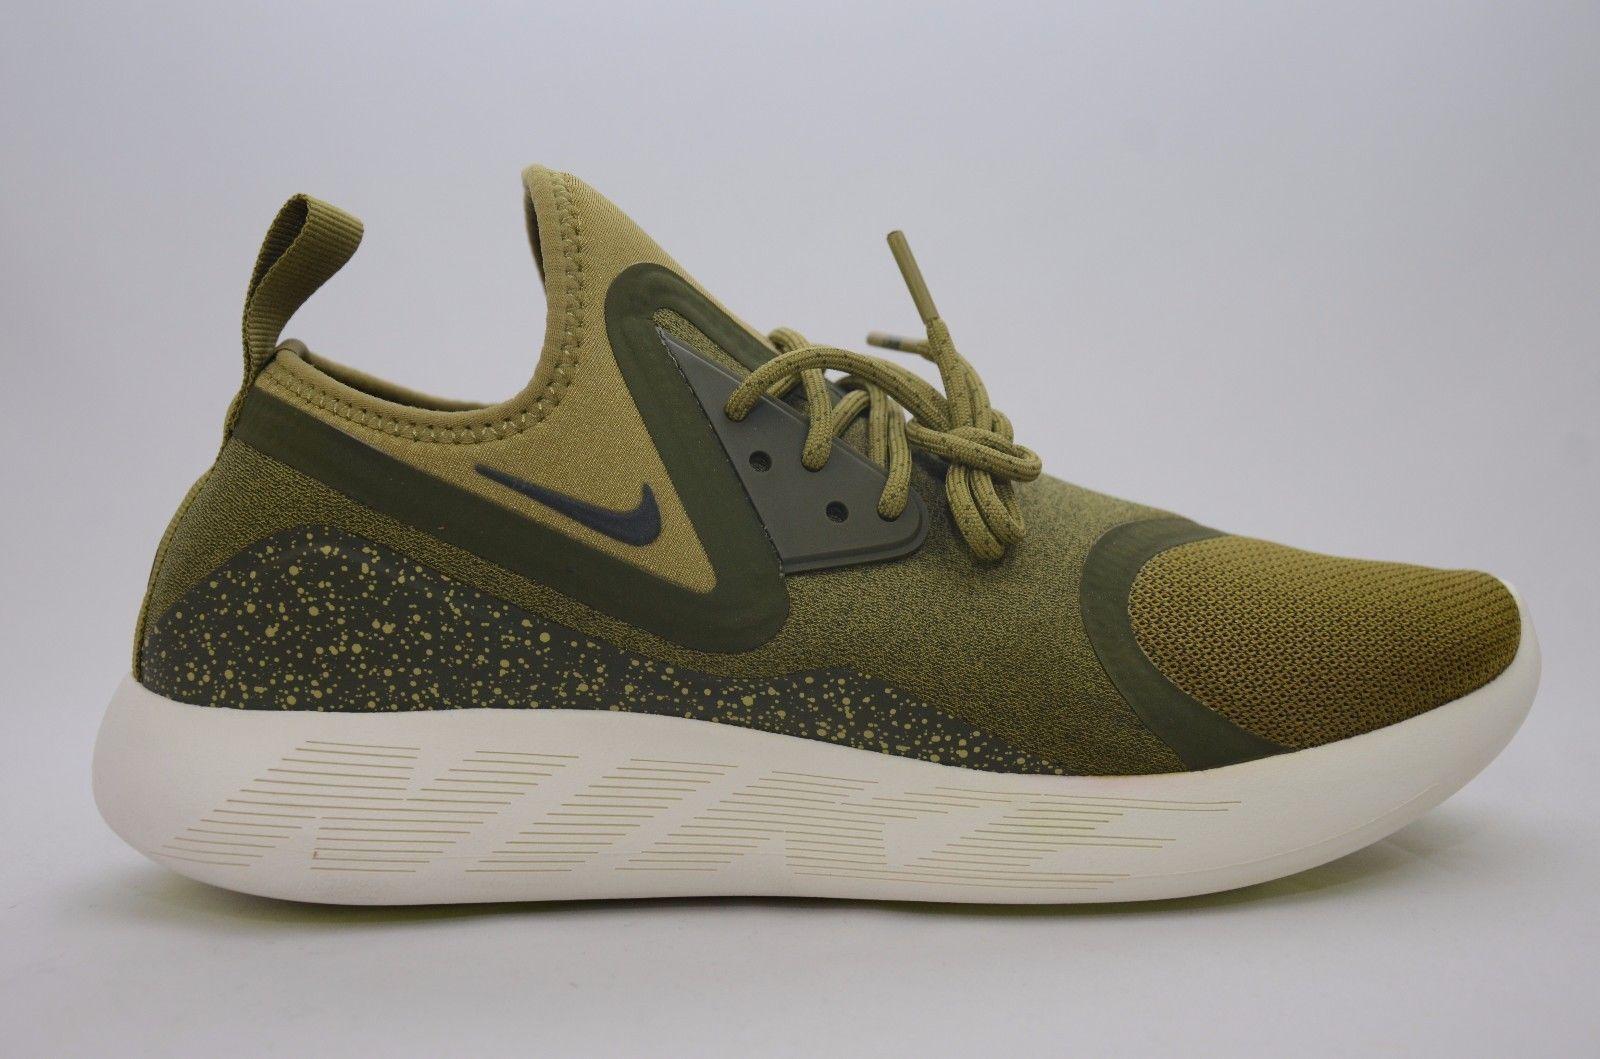 Men's NIKE Lunarcharge Essential Camper shoes 923619-300 Sz  11.5 (091206550048)